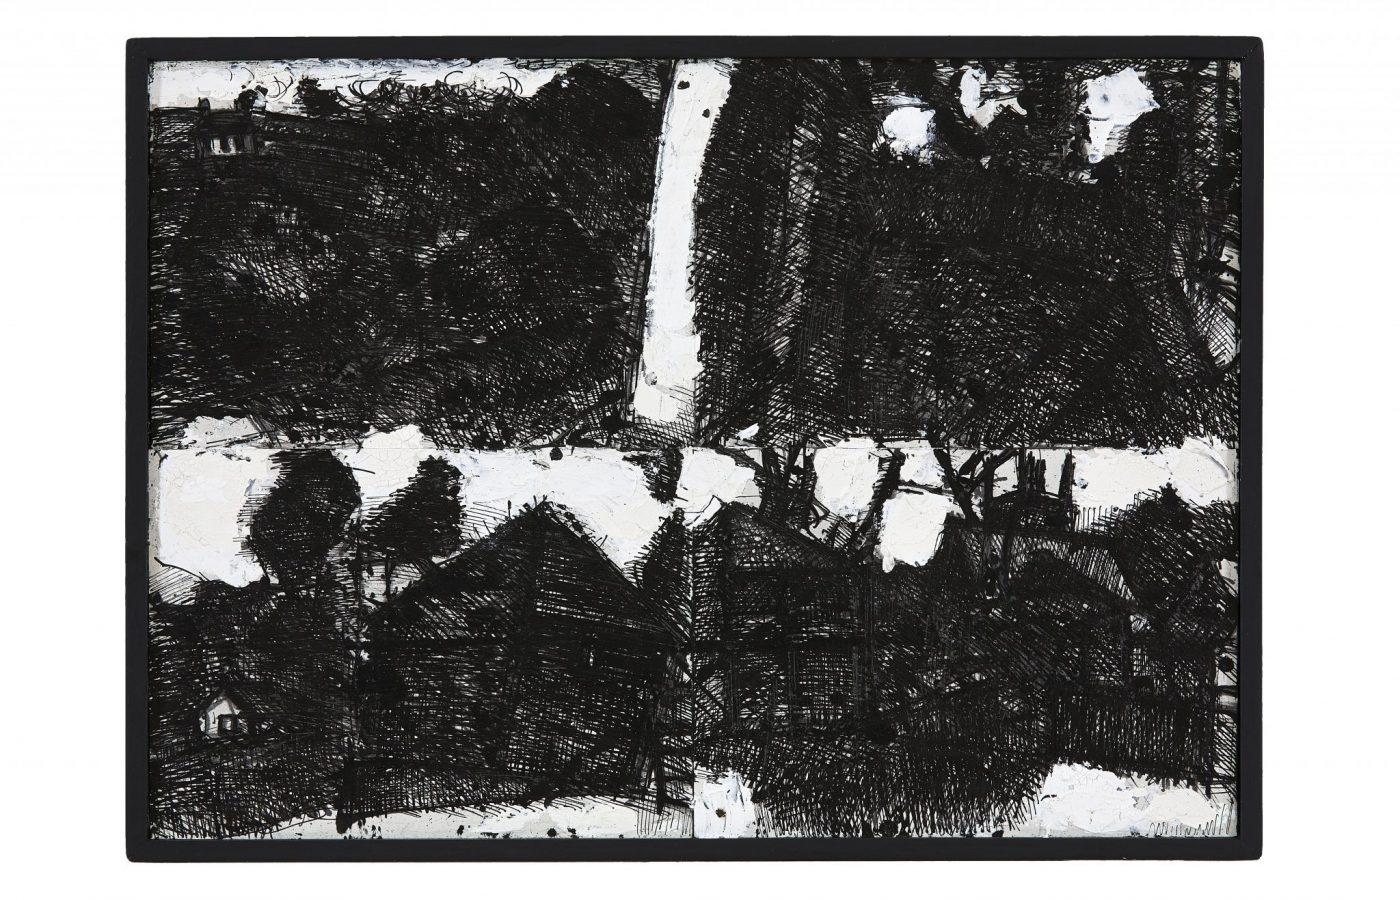 FXF18-51 John Virtue Landscape No 118 1990-91